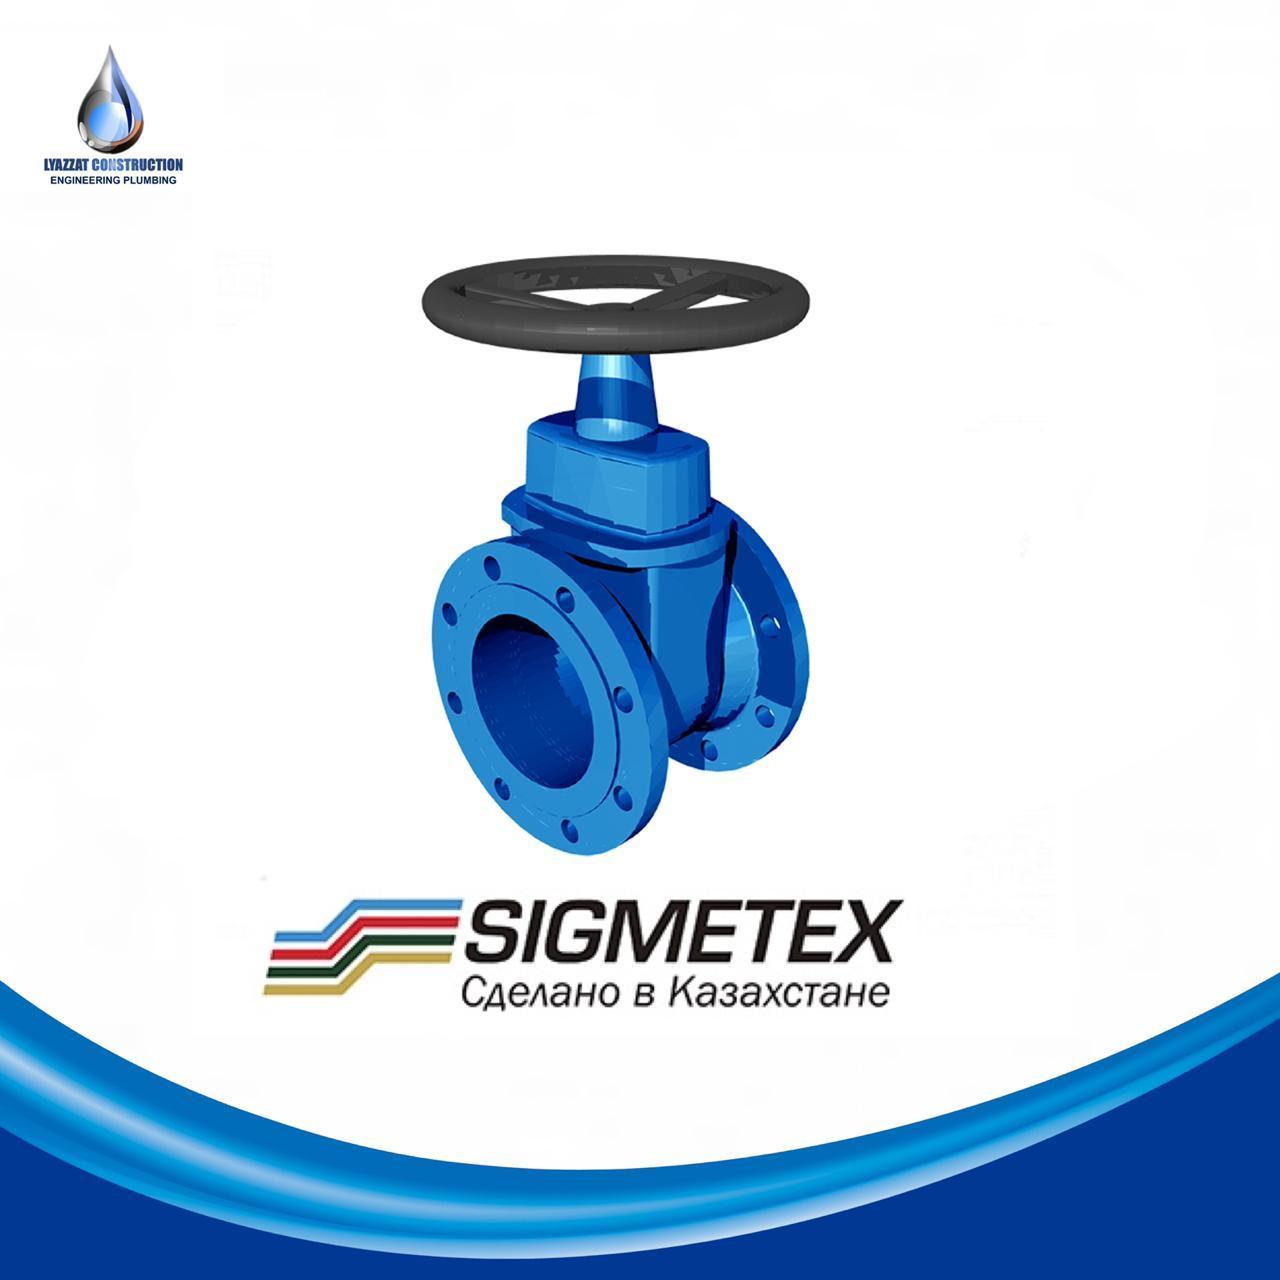 Задвижка Sigmetex DN 50 SM-KZ F4 с электроприводом AUMA